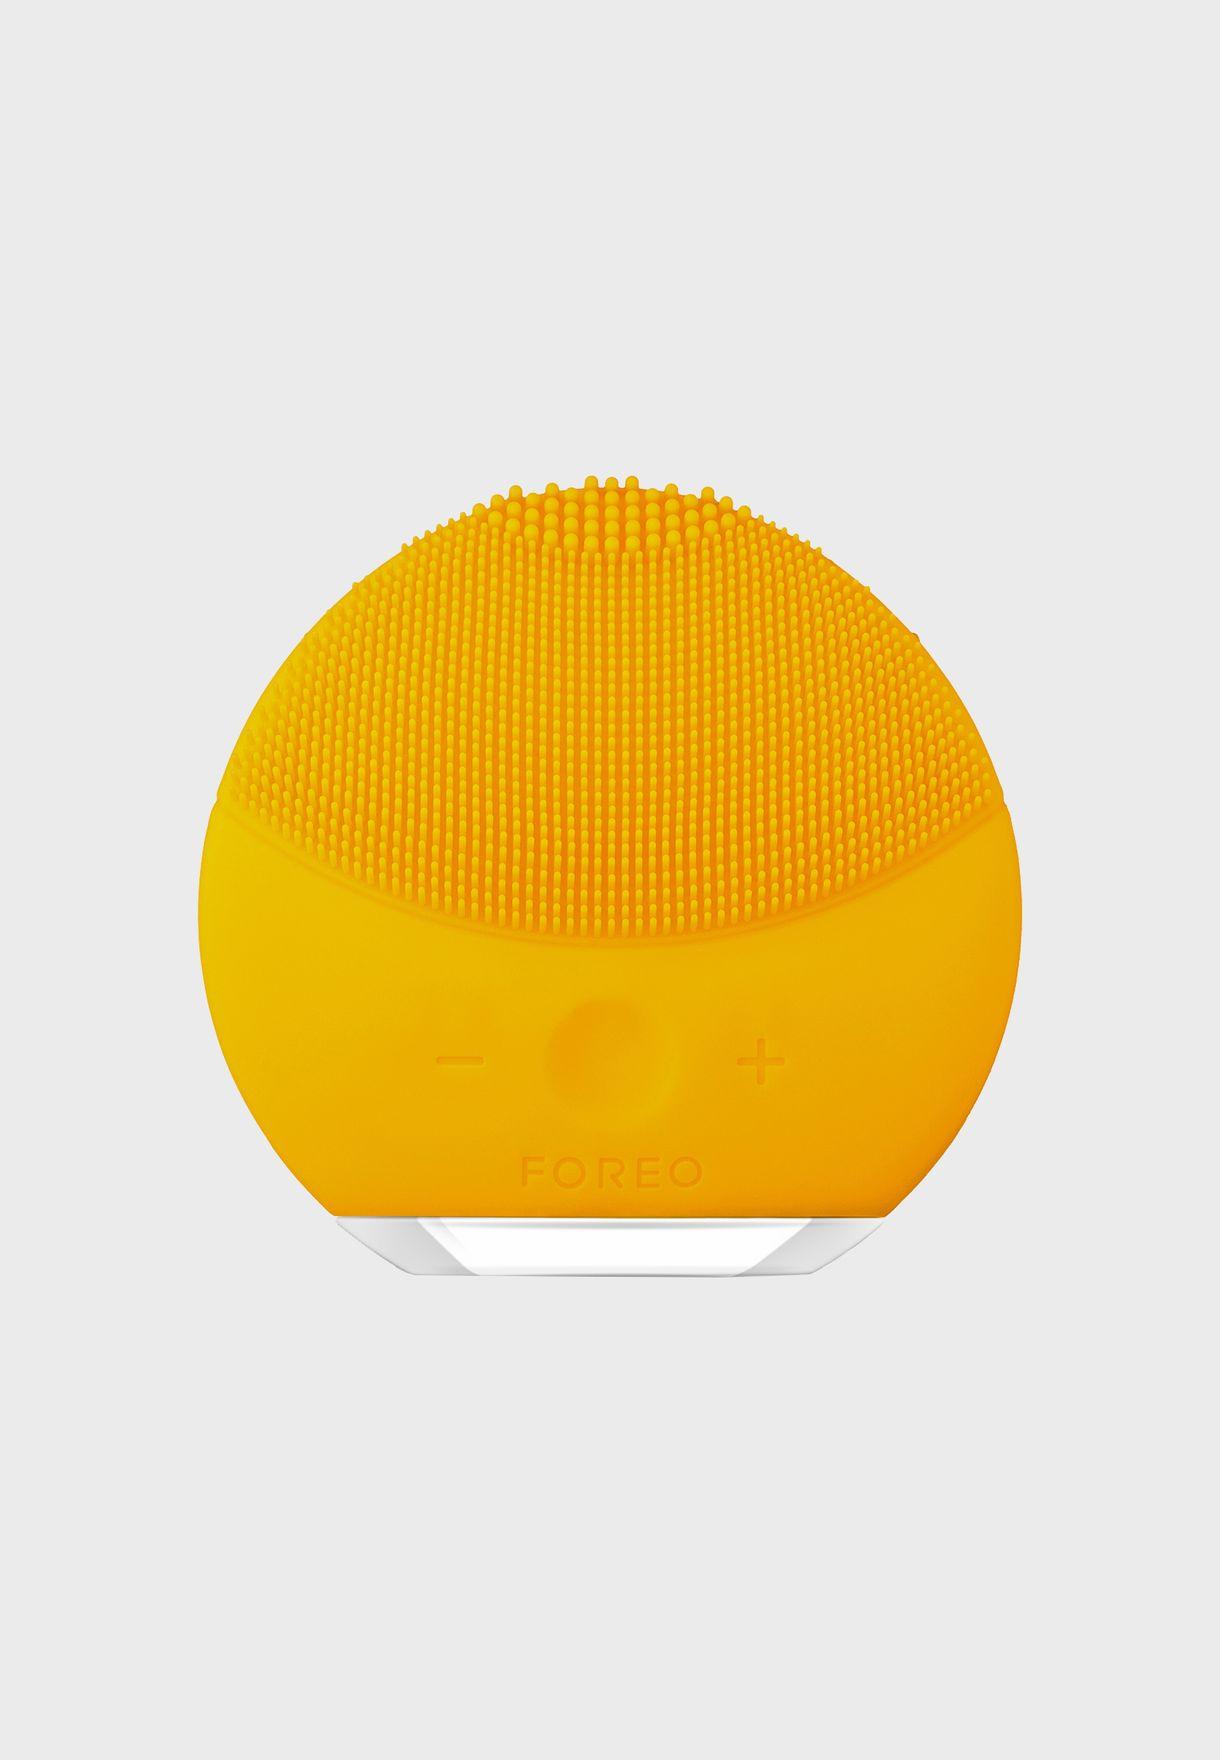 LUNA mini 2 Facial Cleansing Brush - Sunflower Yellow